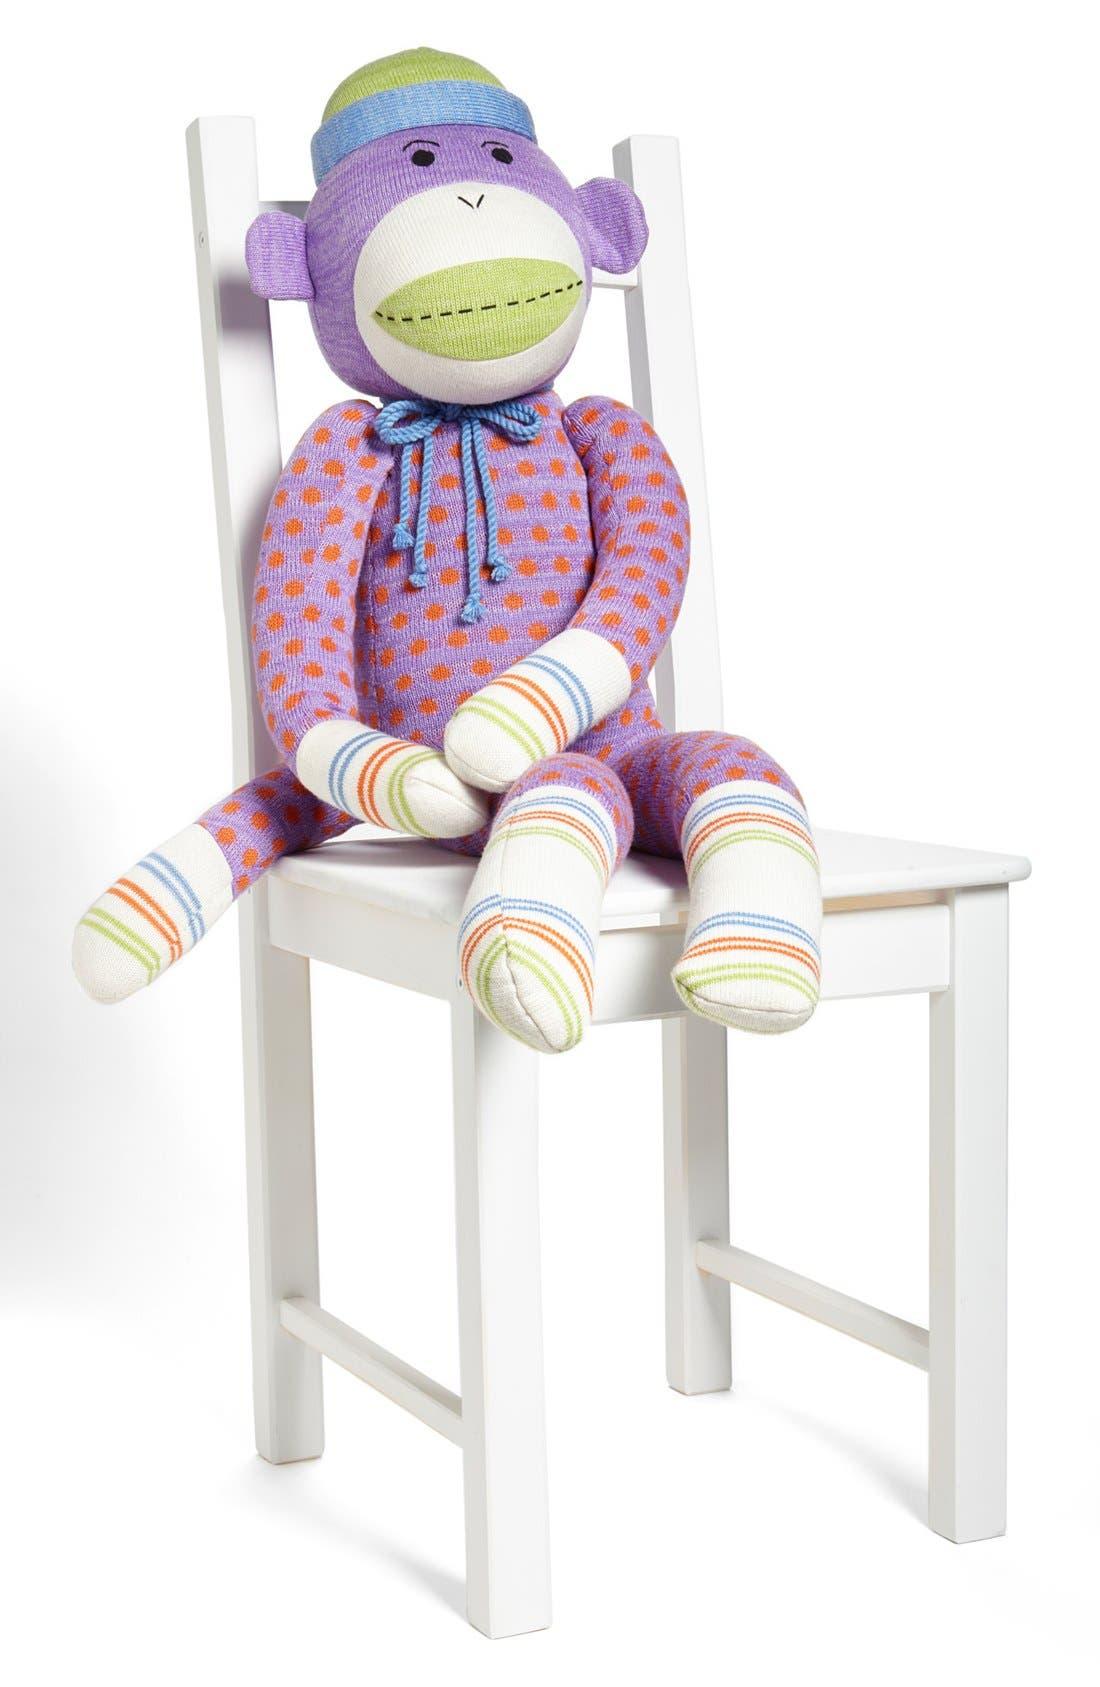 Alternate Image 1 Selected - Genuine Monkeez & Friends 'Dotty - Jumbo' Stuffed Monkey